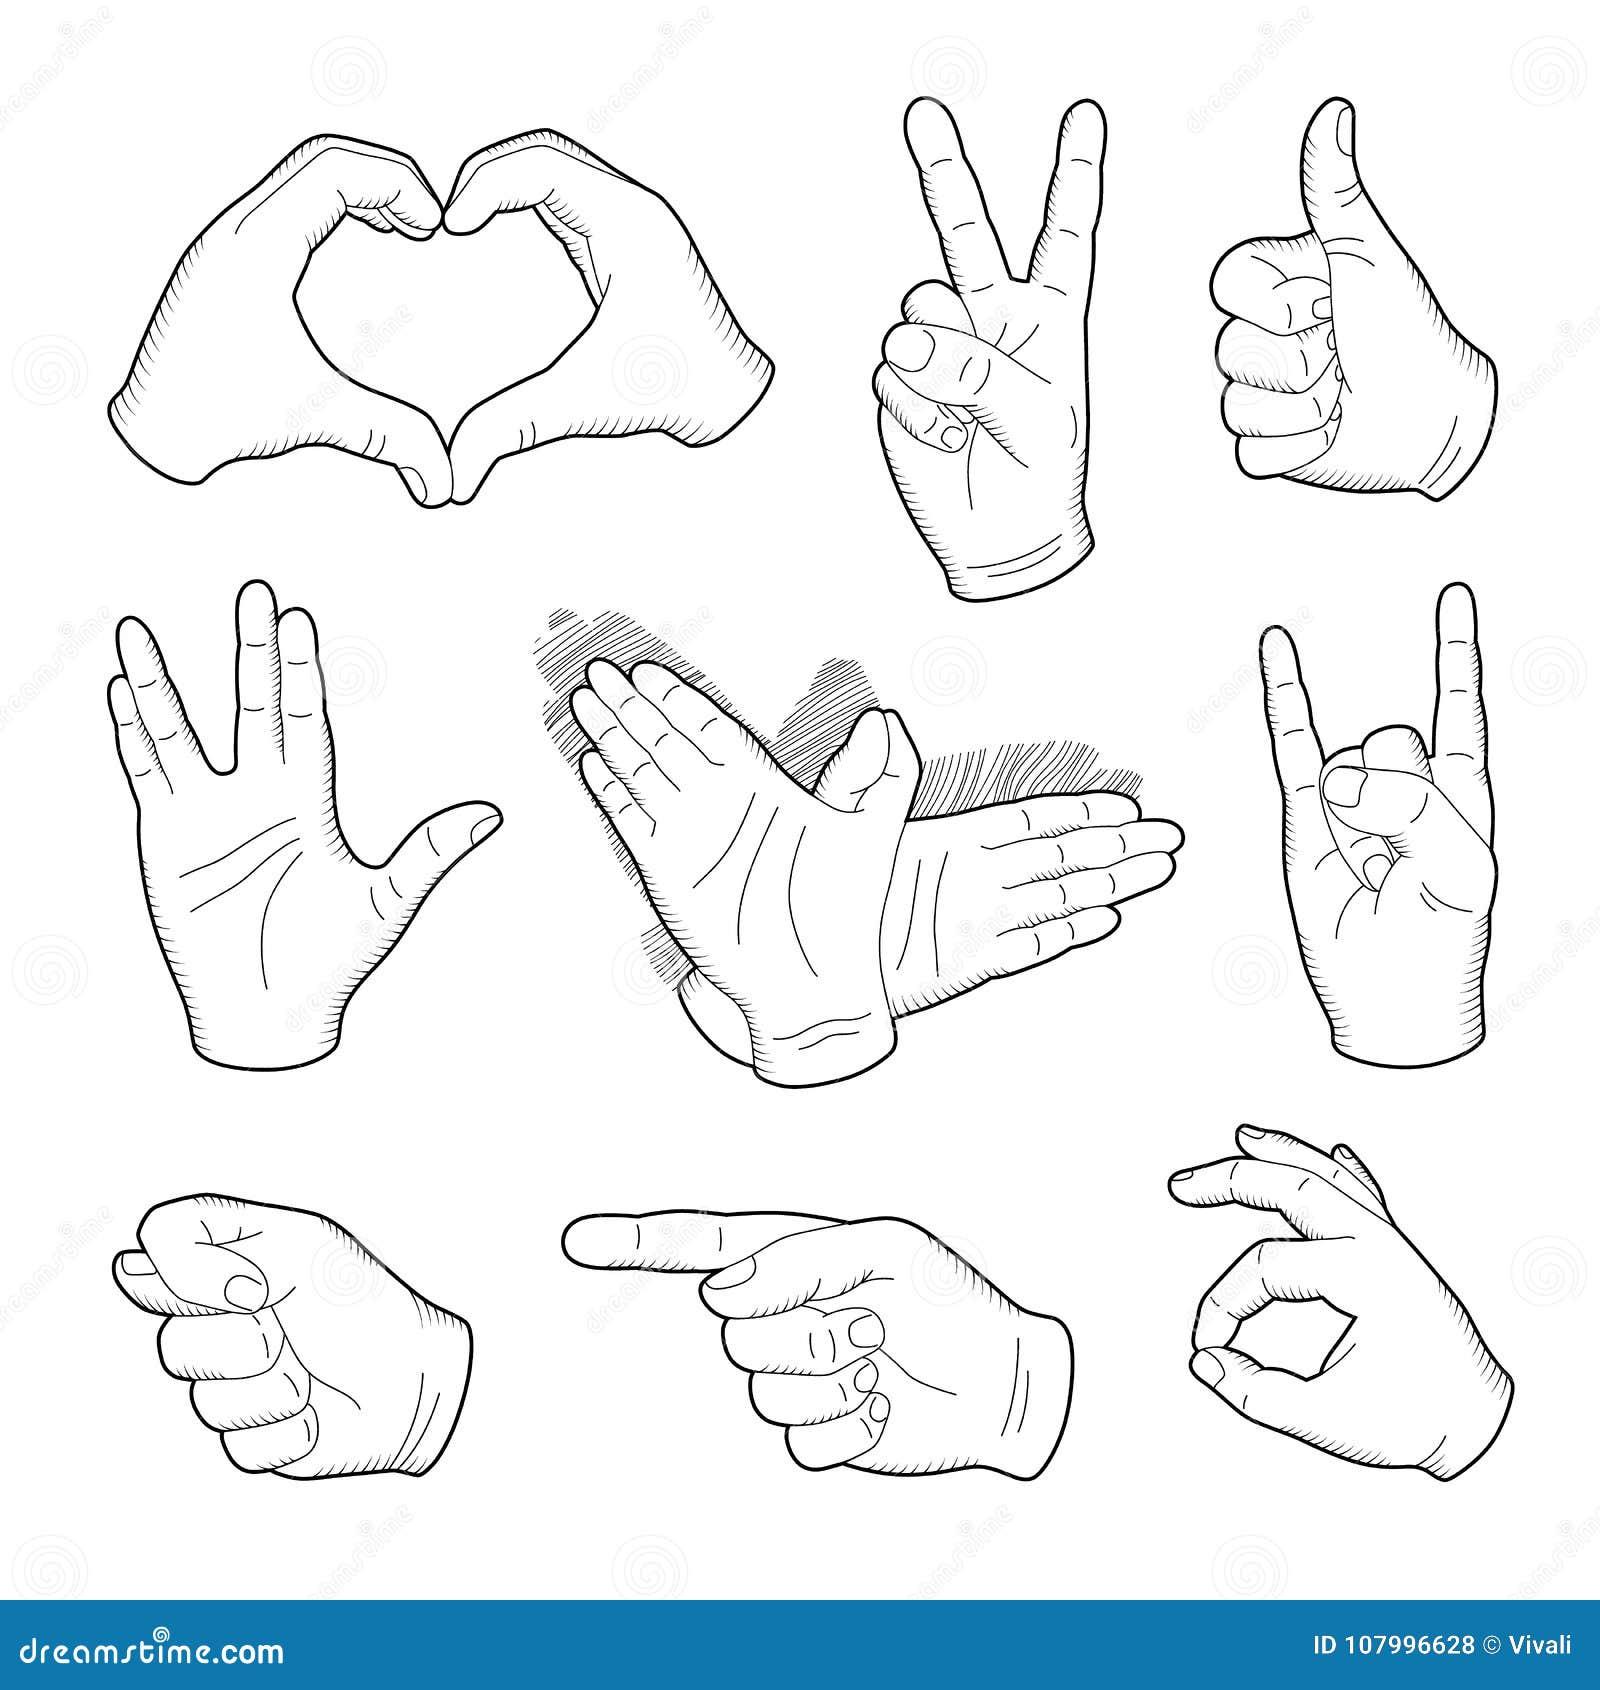 Dessin humain de main de vintage avec diriger le doigt le - Dessin de doigt ...